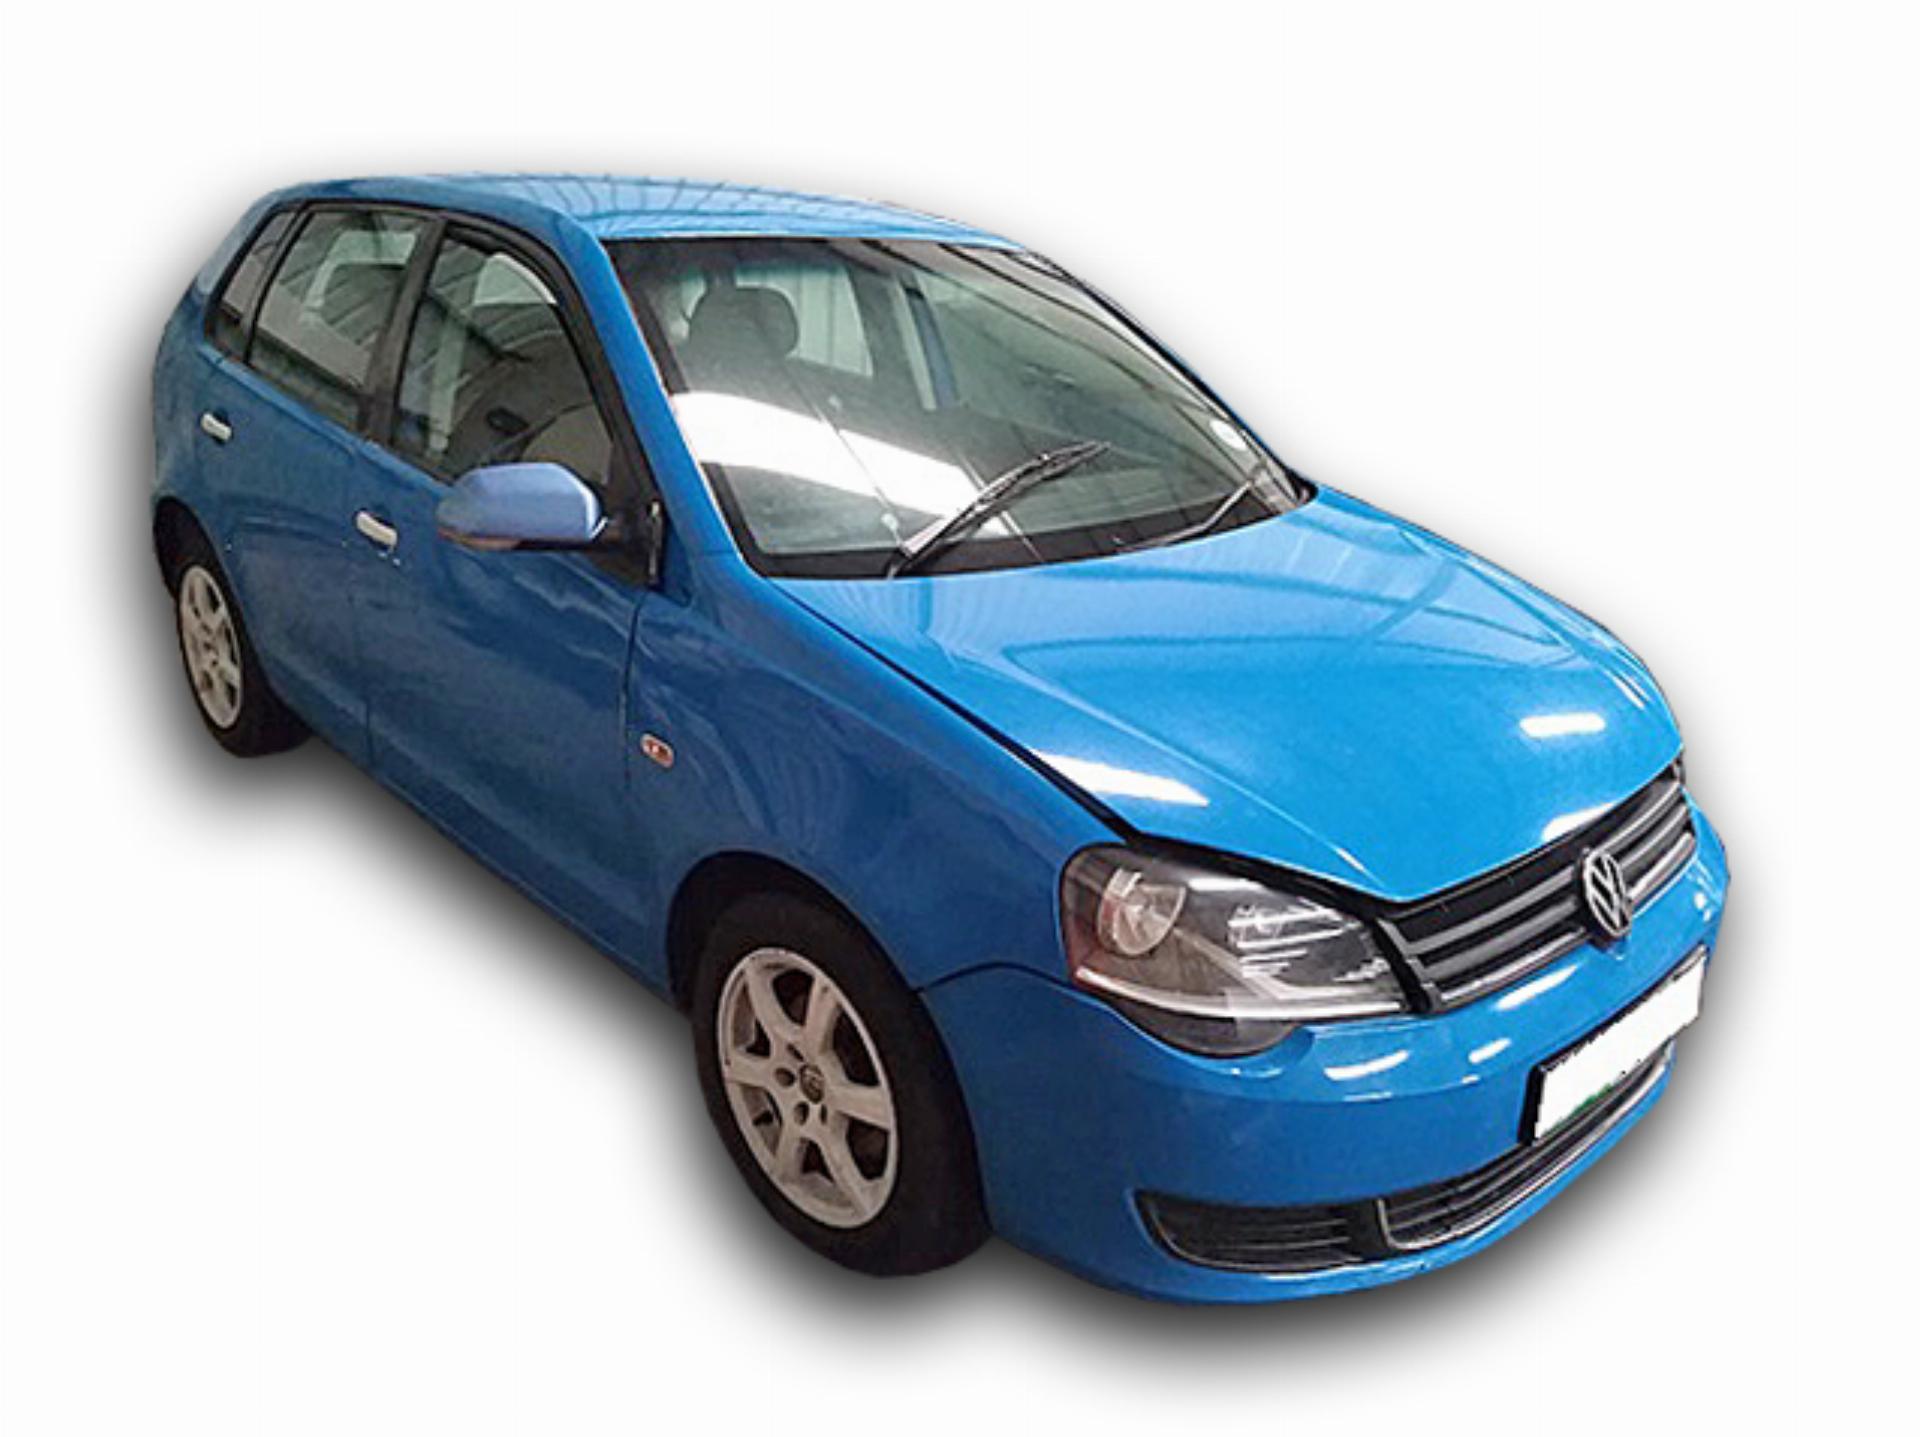 Volkswagen Citi Vivo 1.4